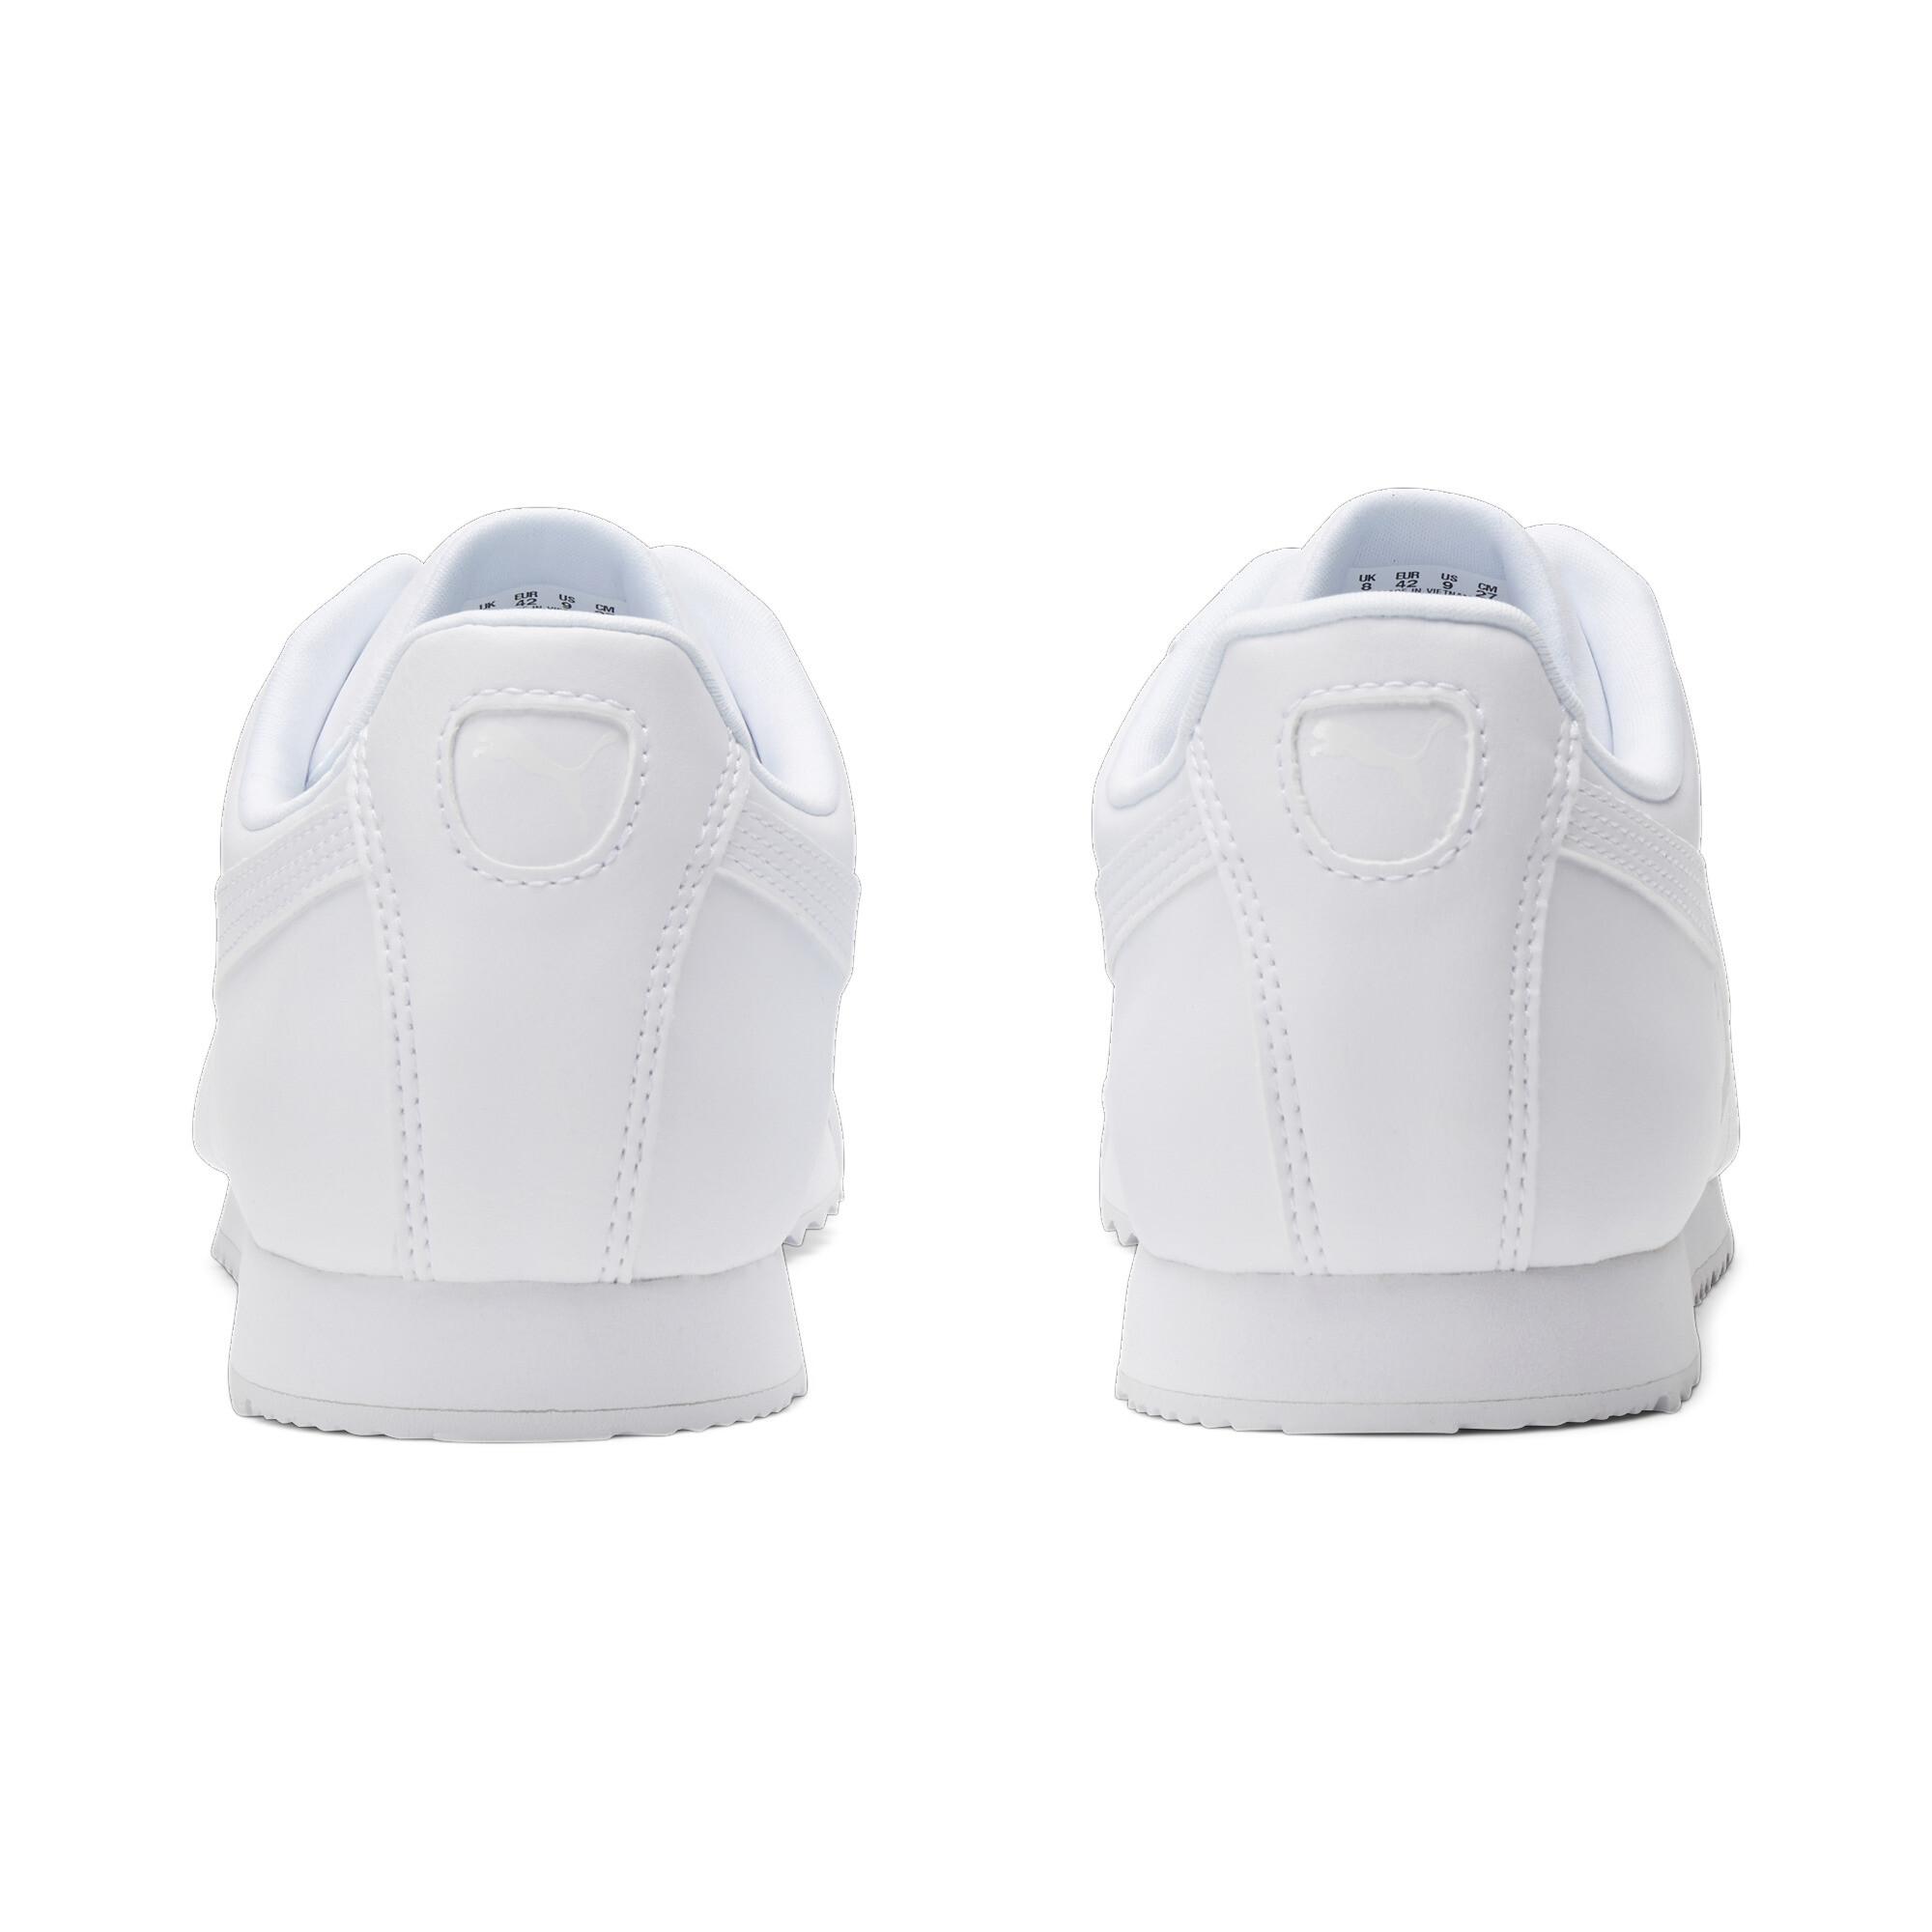 miniature 15 - Puma Men's Roma Basic Sneakers